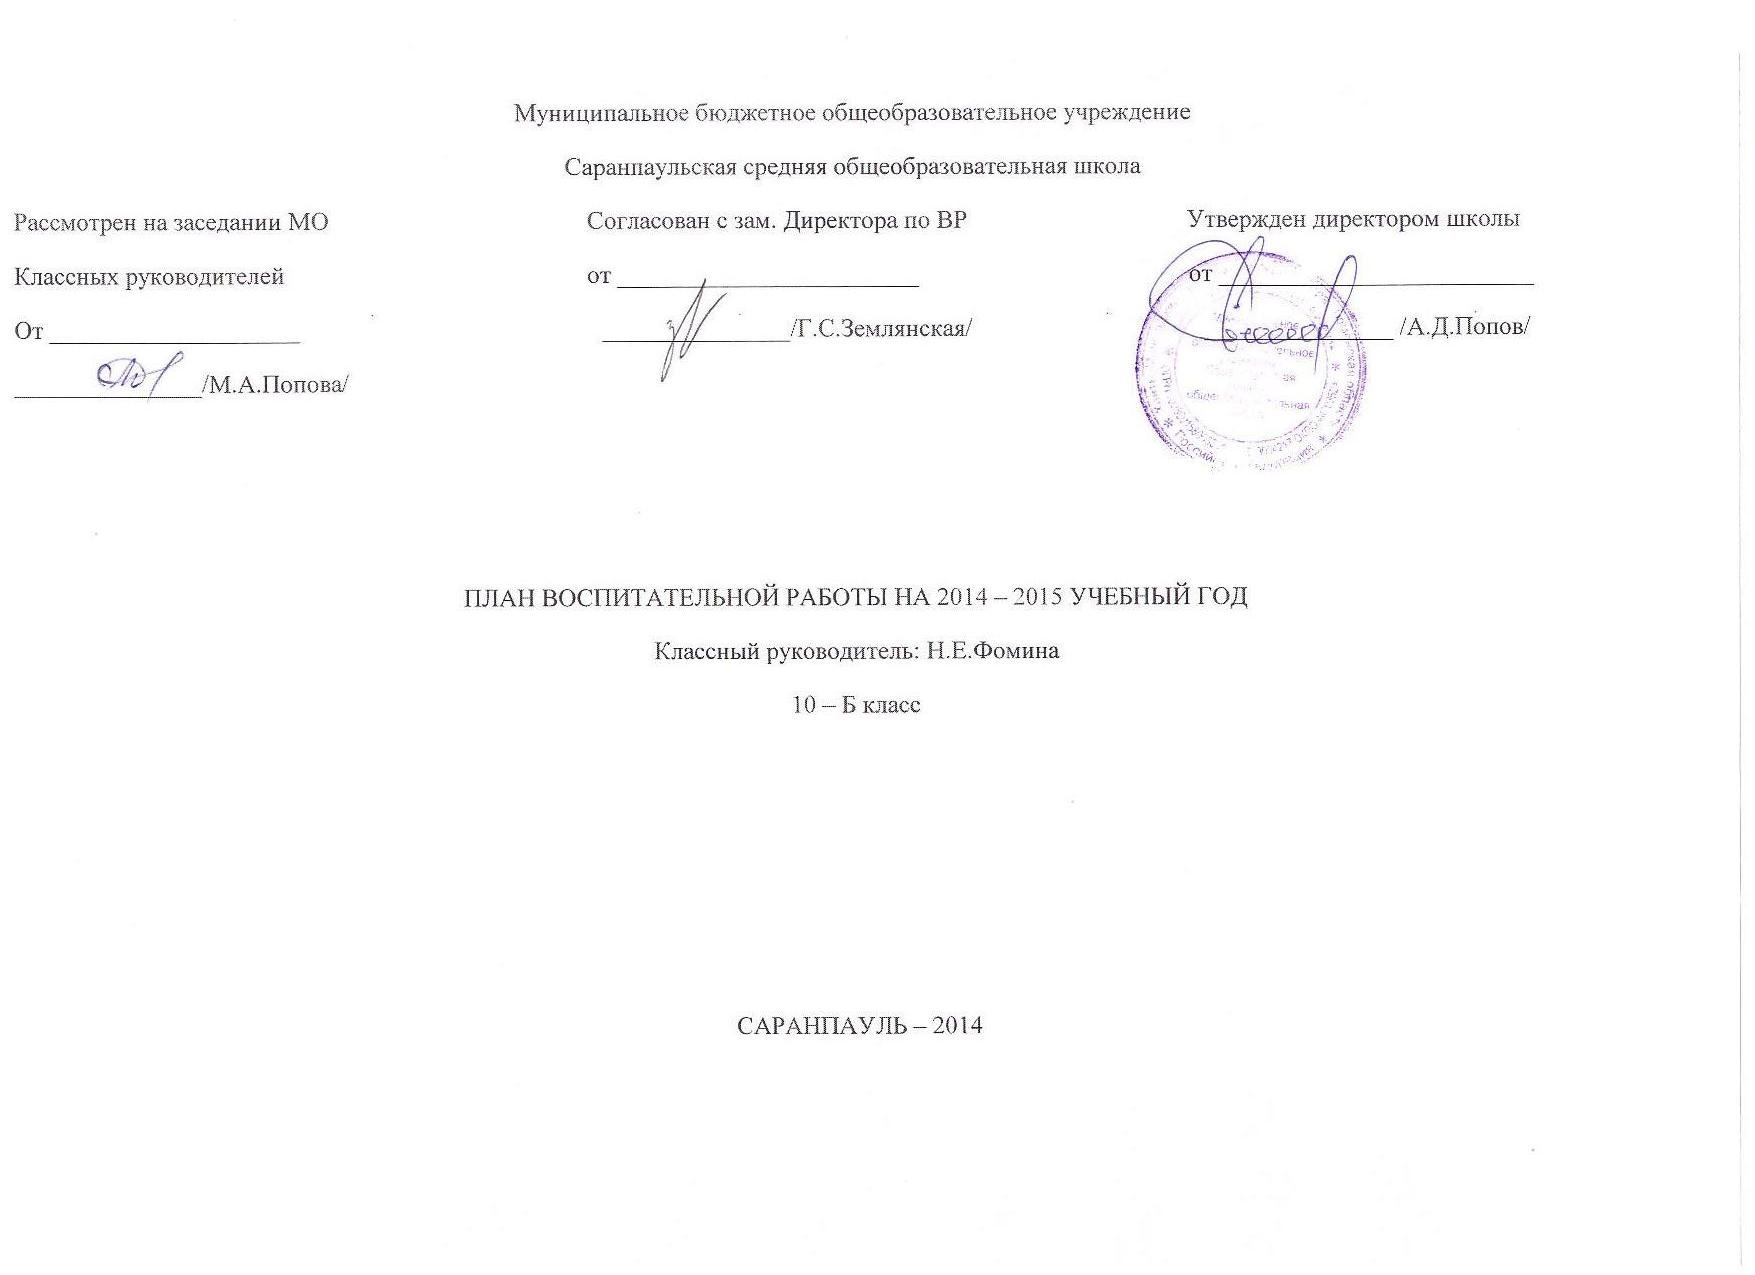 C:\Documents and Settings\1\Рабочий стол\Изображение 003.jpg